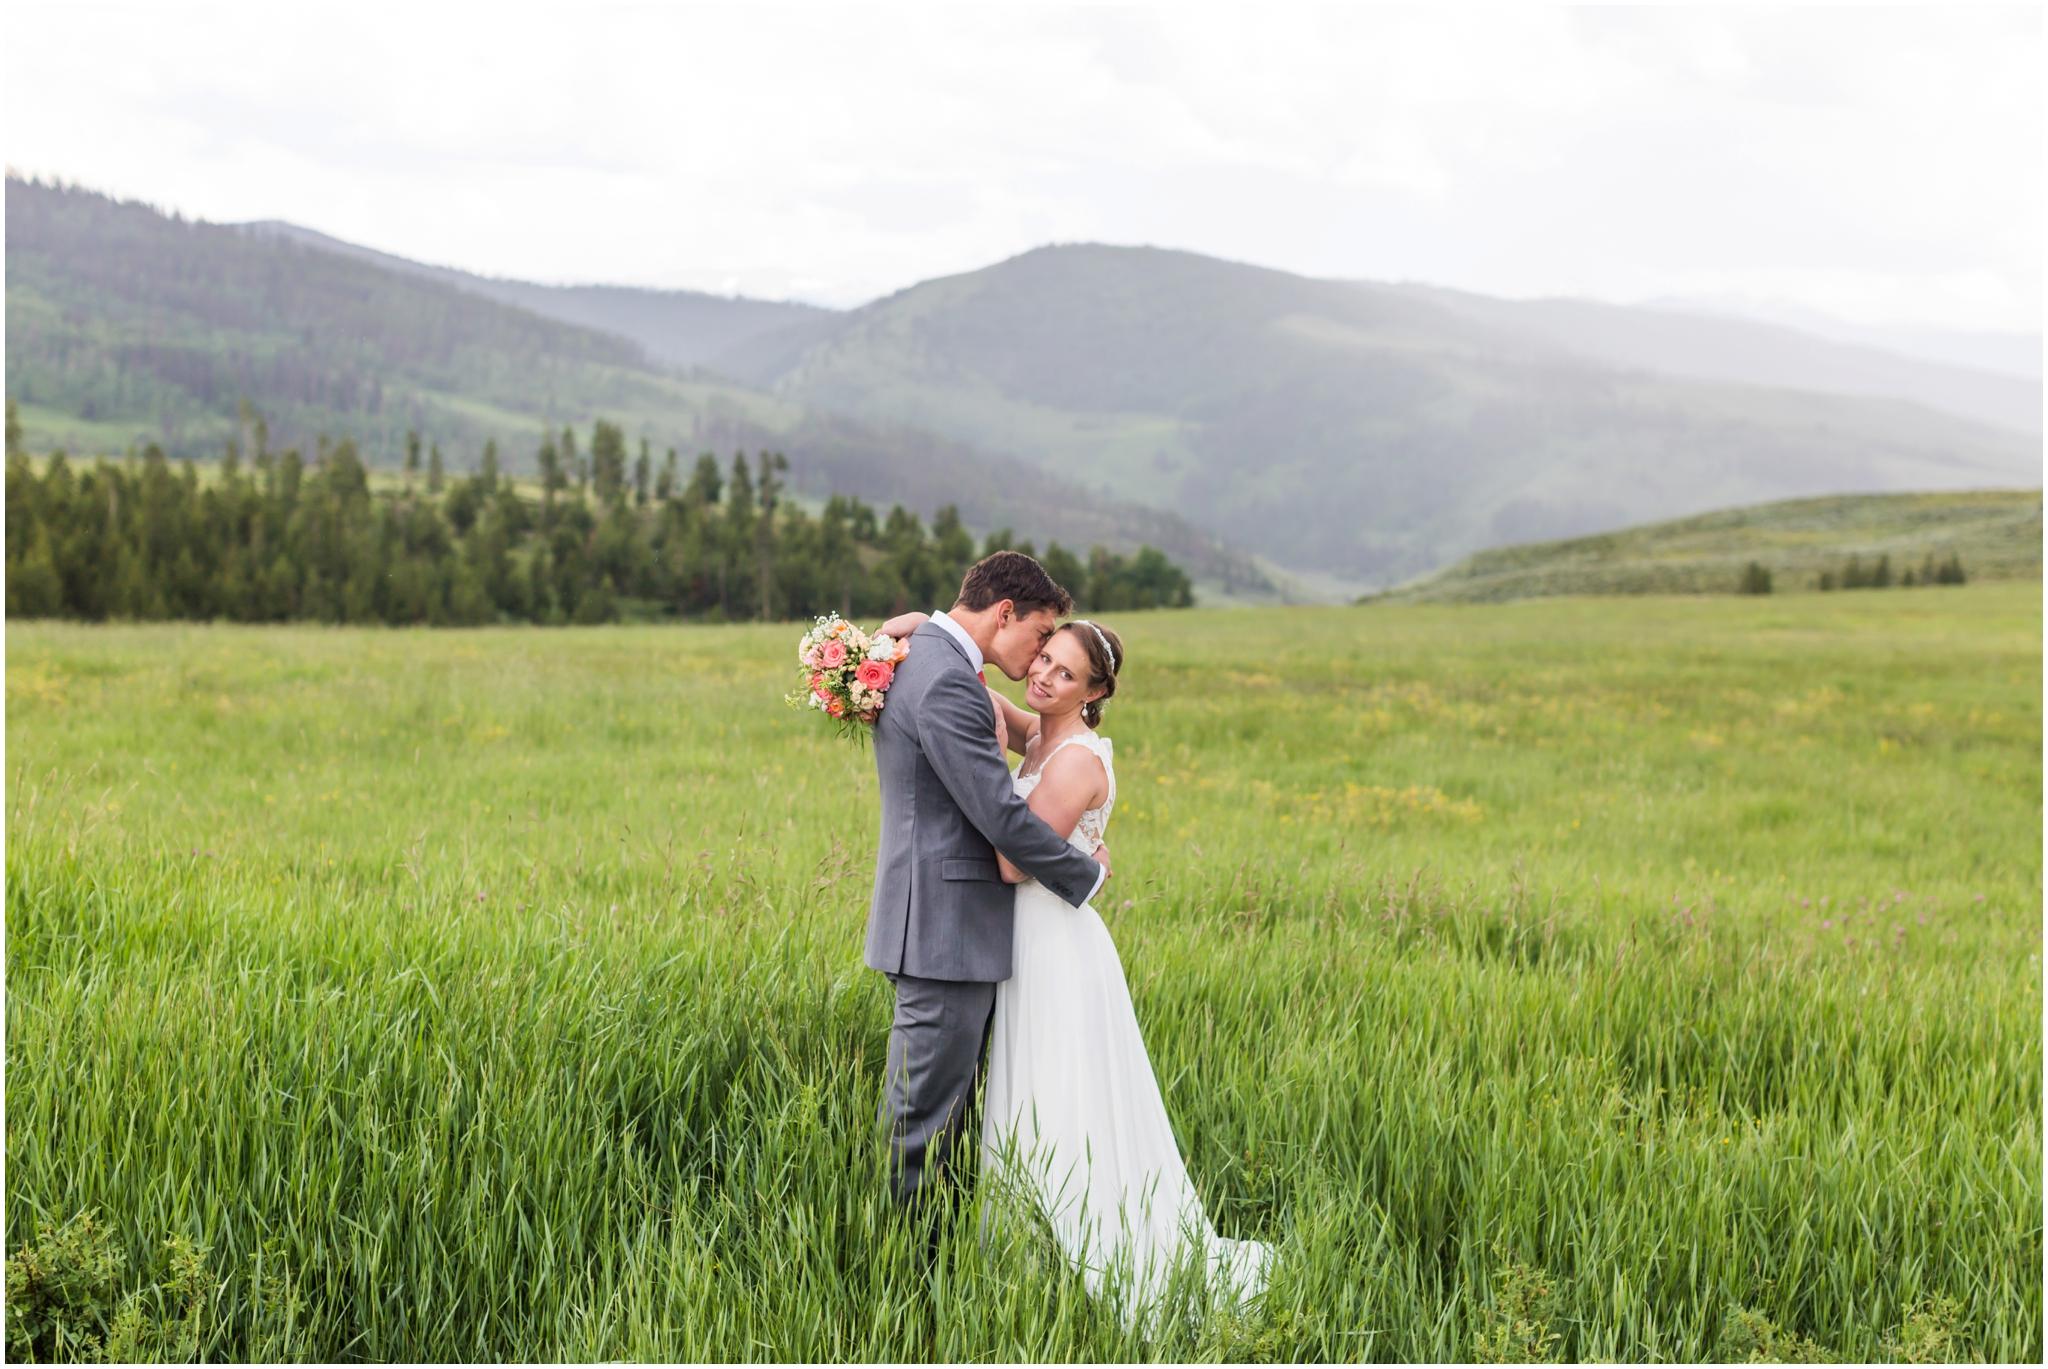 Strawberry_Creek_Ranch_Wedding_Photographer22.jpg